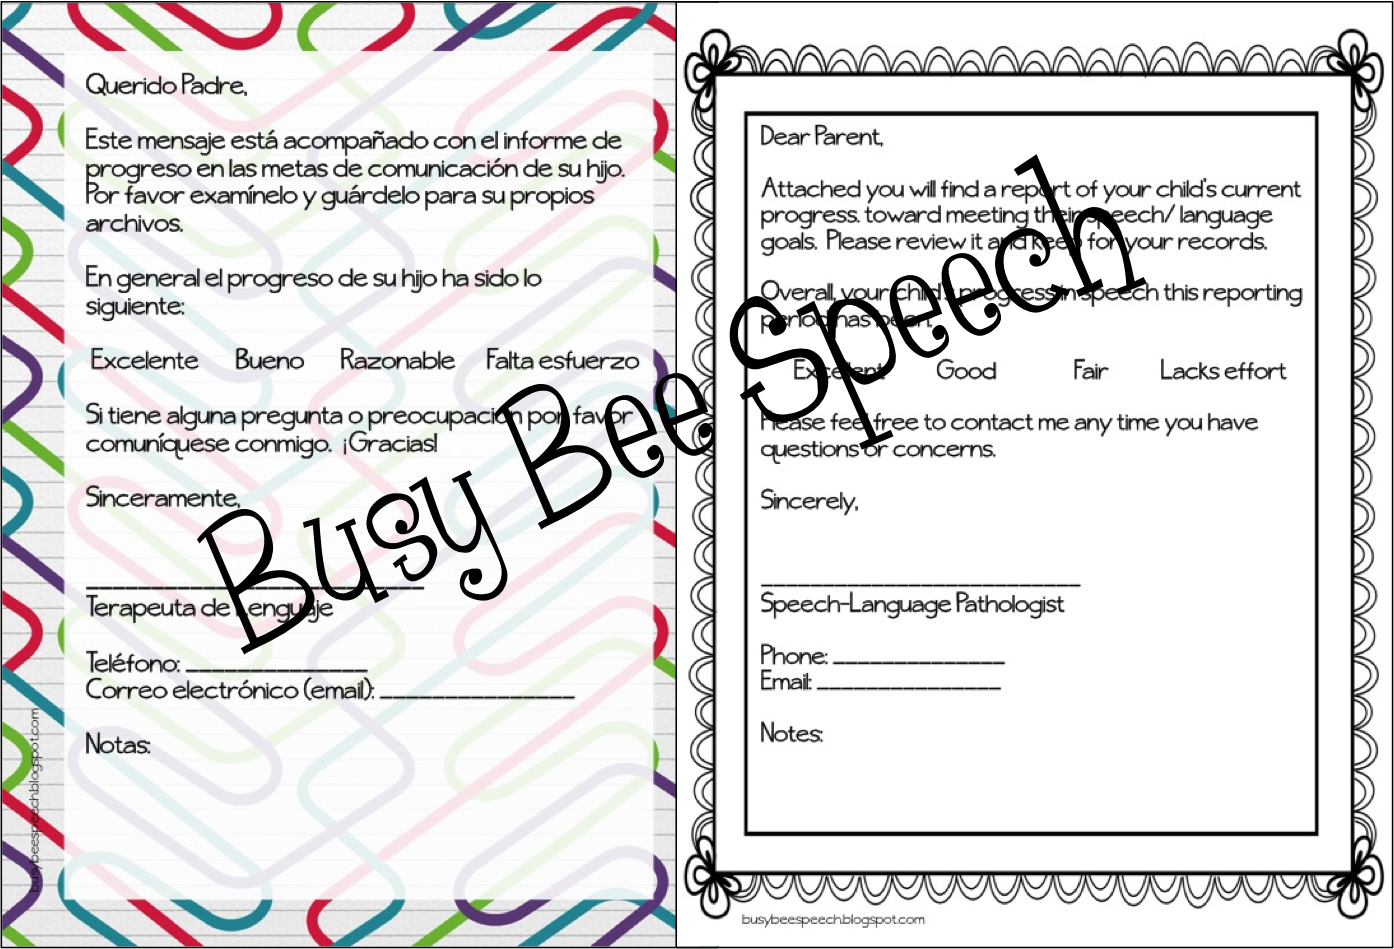 Nice Speech Therapist Resume Sample Reentrycorps Sample Resume Resume Cover  Letter Speech Pathologist Reentrycorps